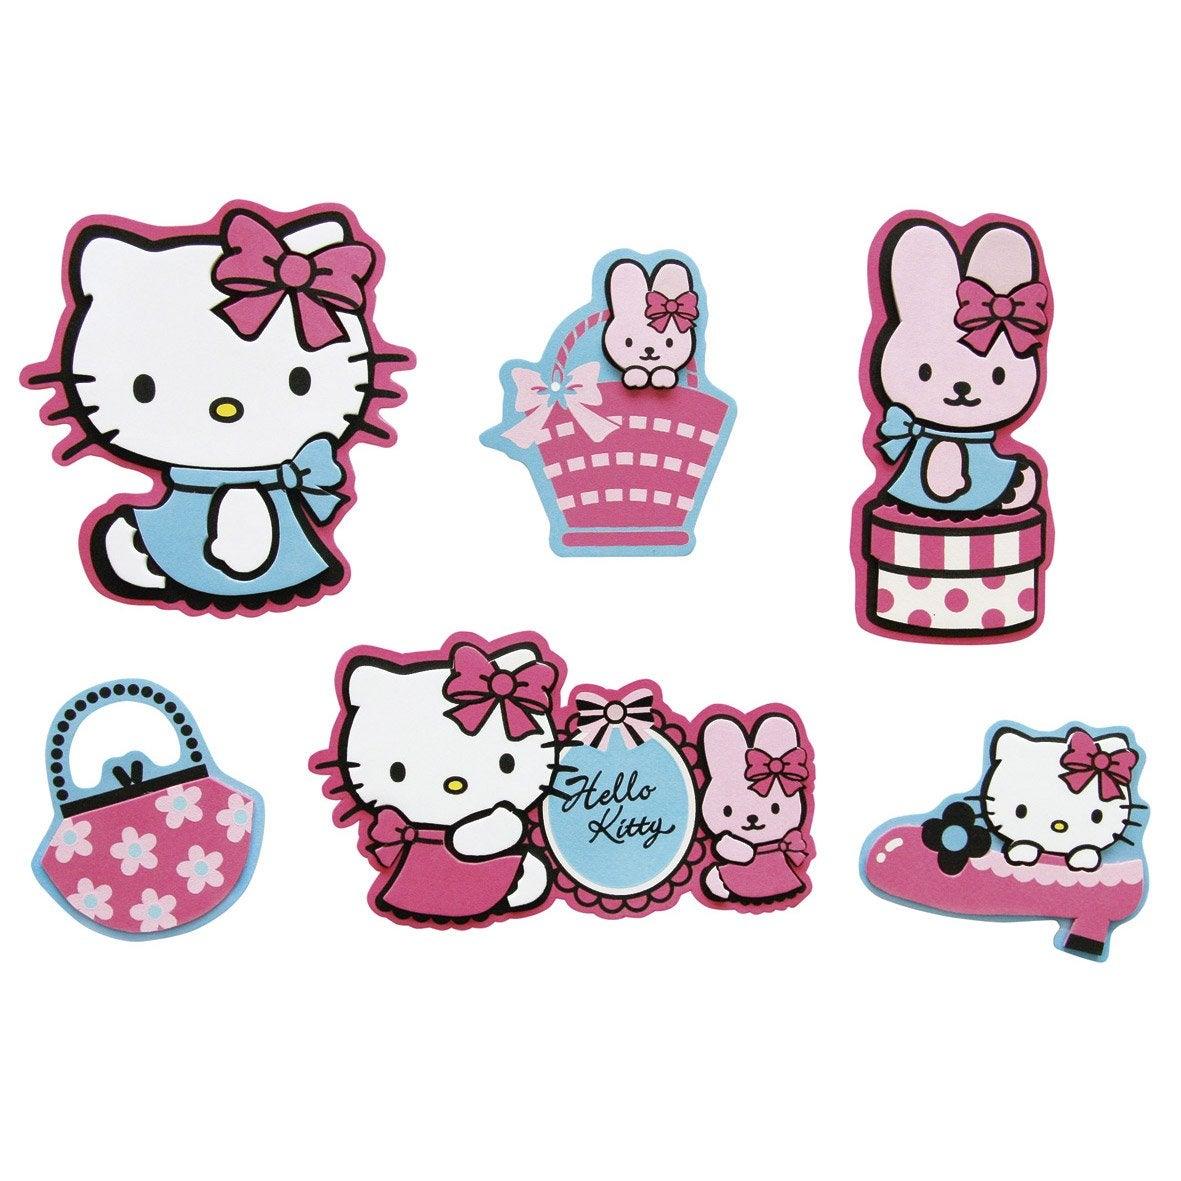 sticker en relief hello kitty 12 cm x 12 cm leroy merlin. Black Bedroom Furniture Sets. Home Design Ideas